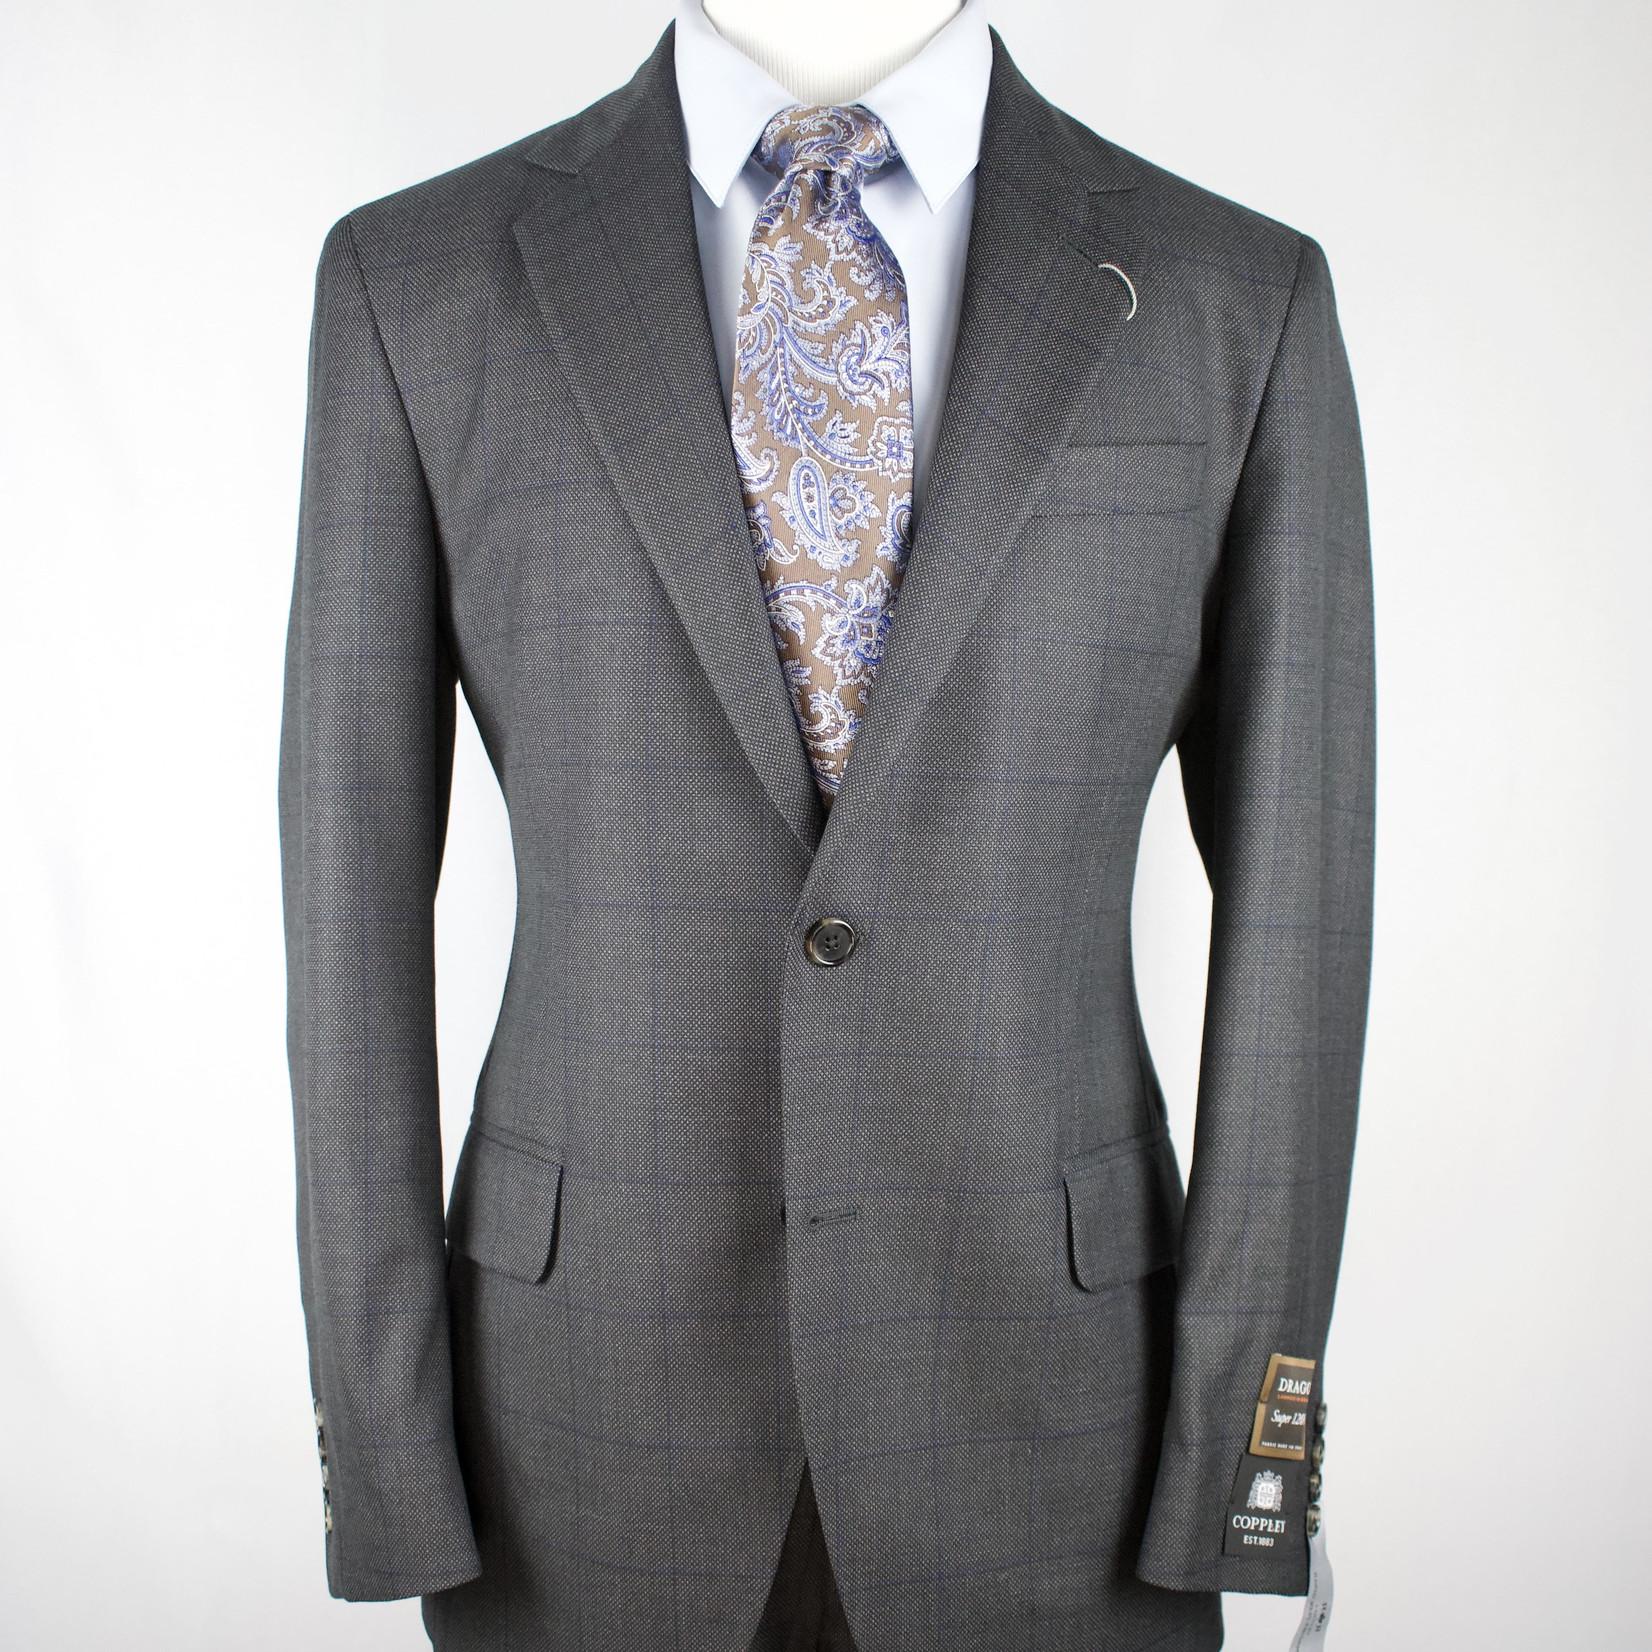 Coppley Coppley Suit Charcoal Windowpane